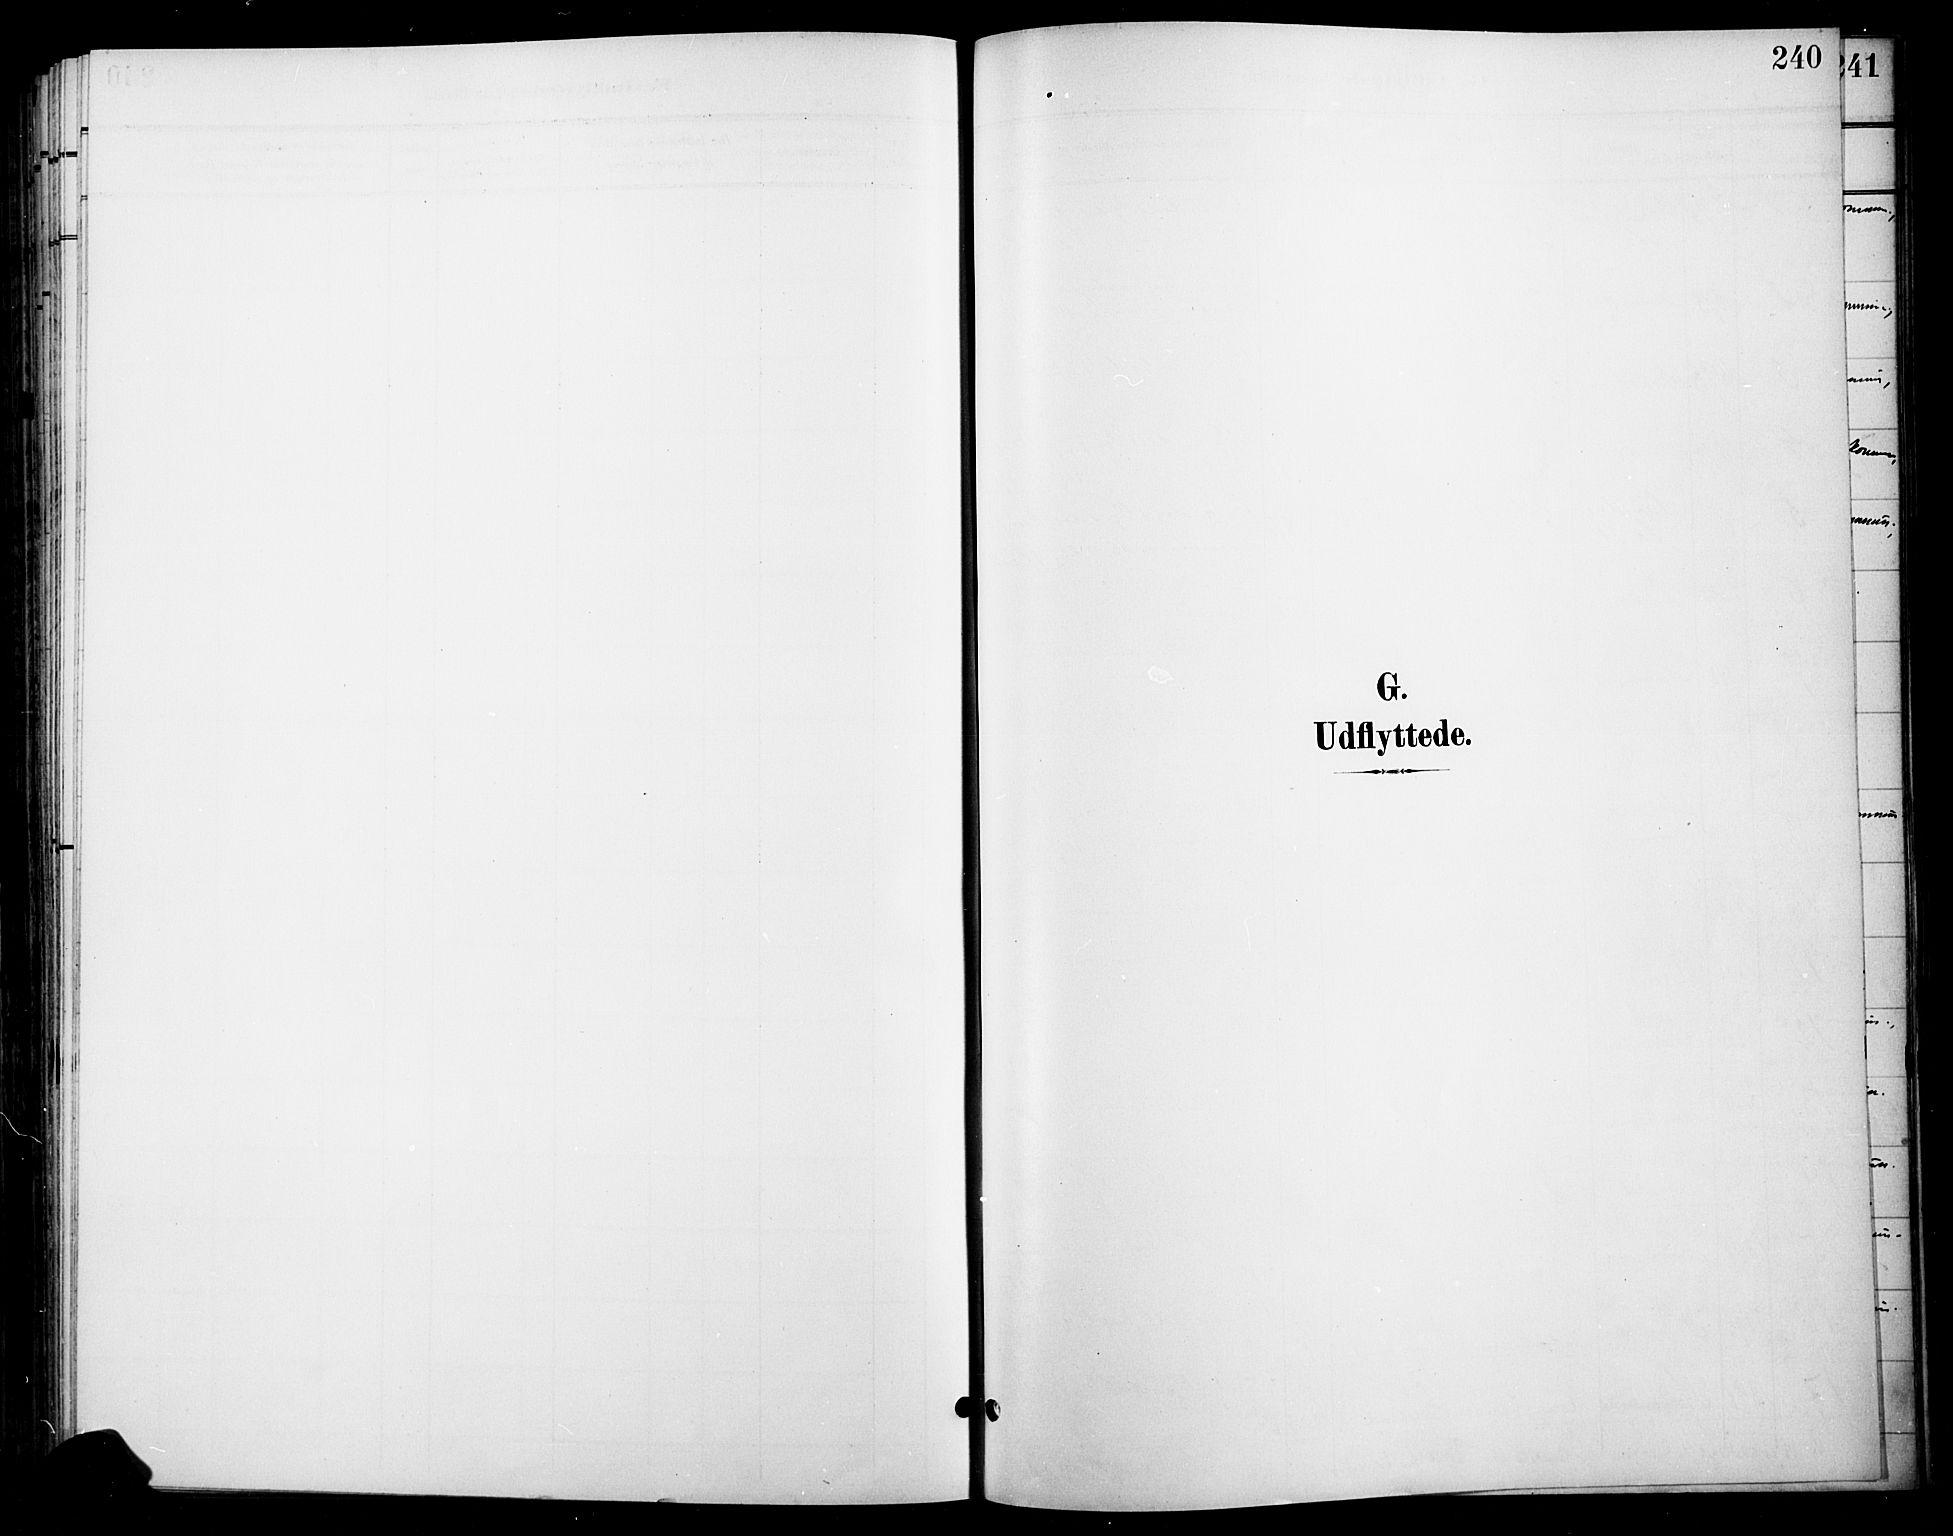 SAH, Gran prestekontor, Ministerialbok nr. 19, 1898-1907, s. 240